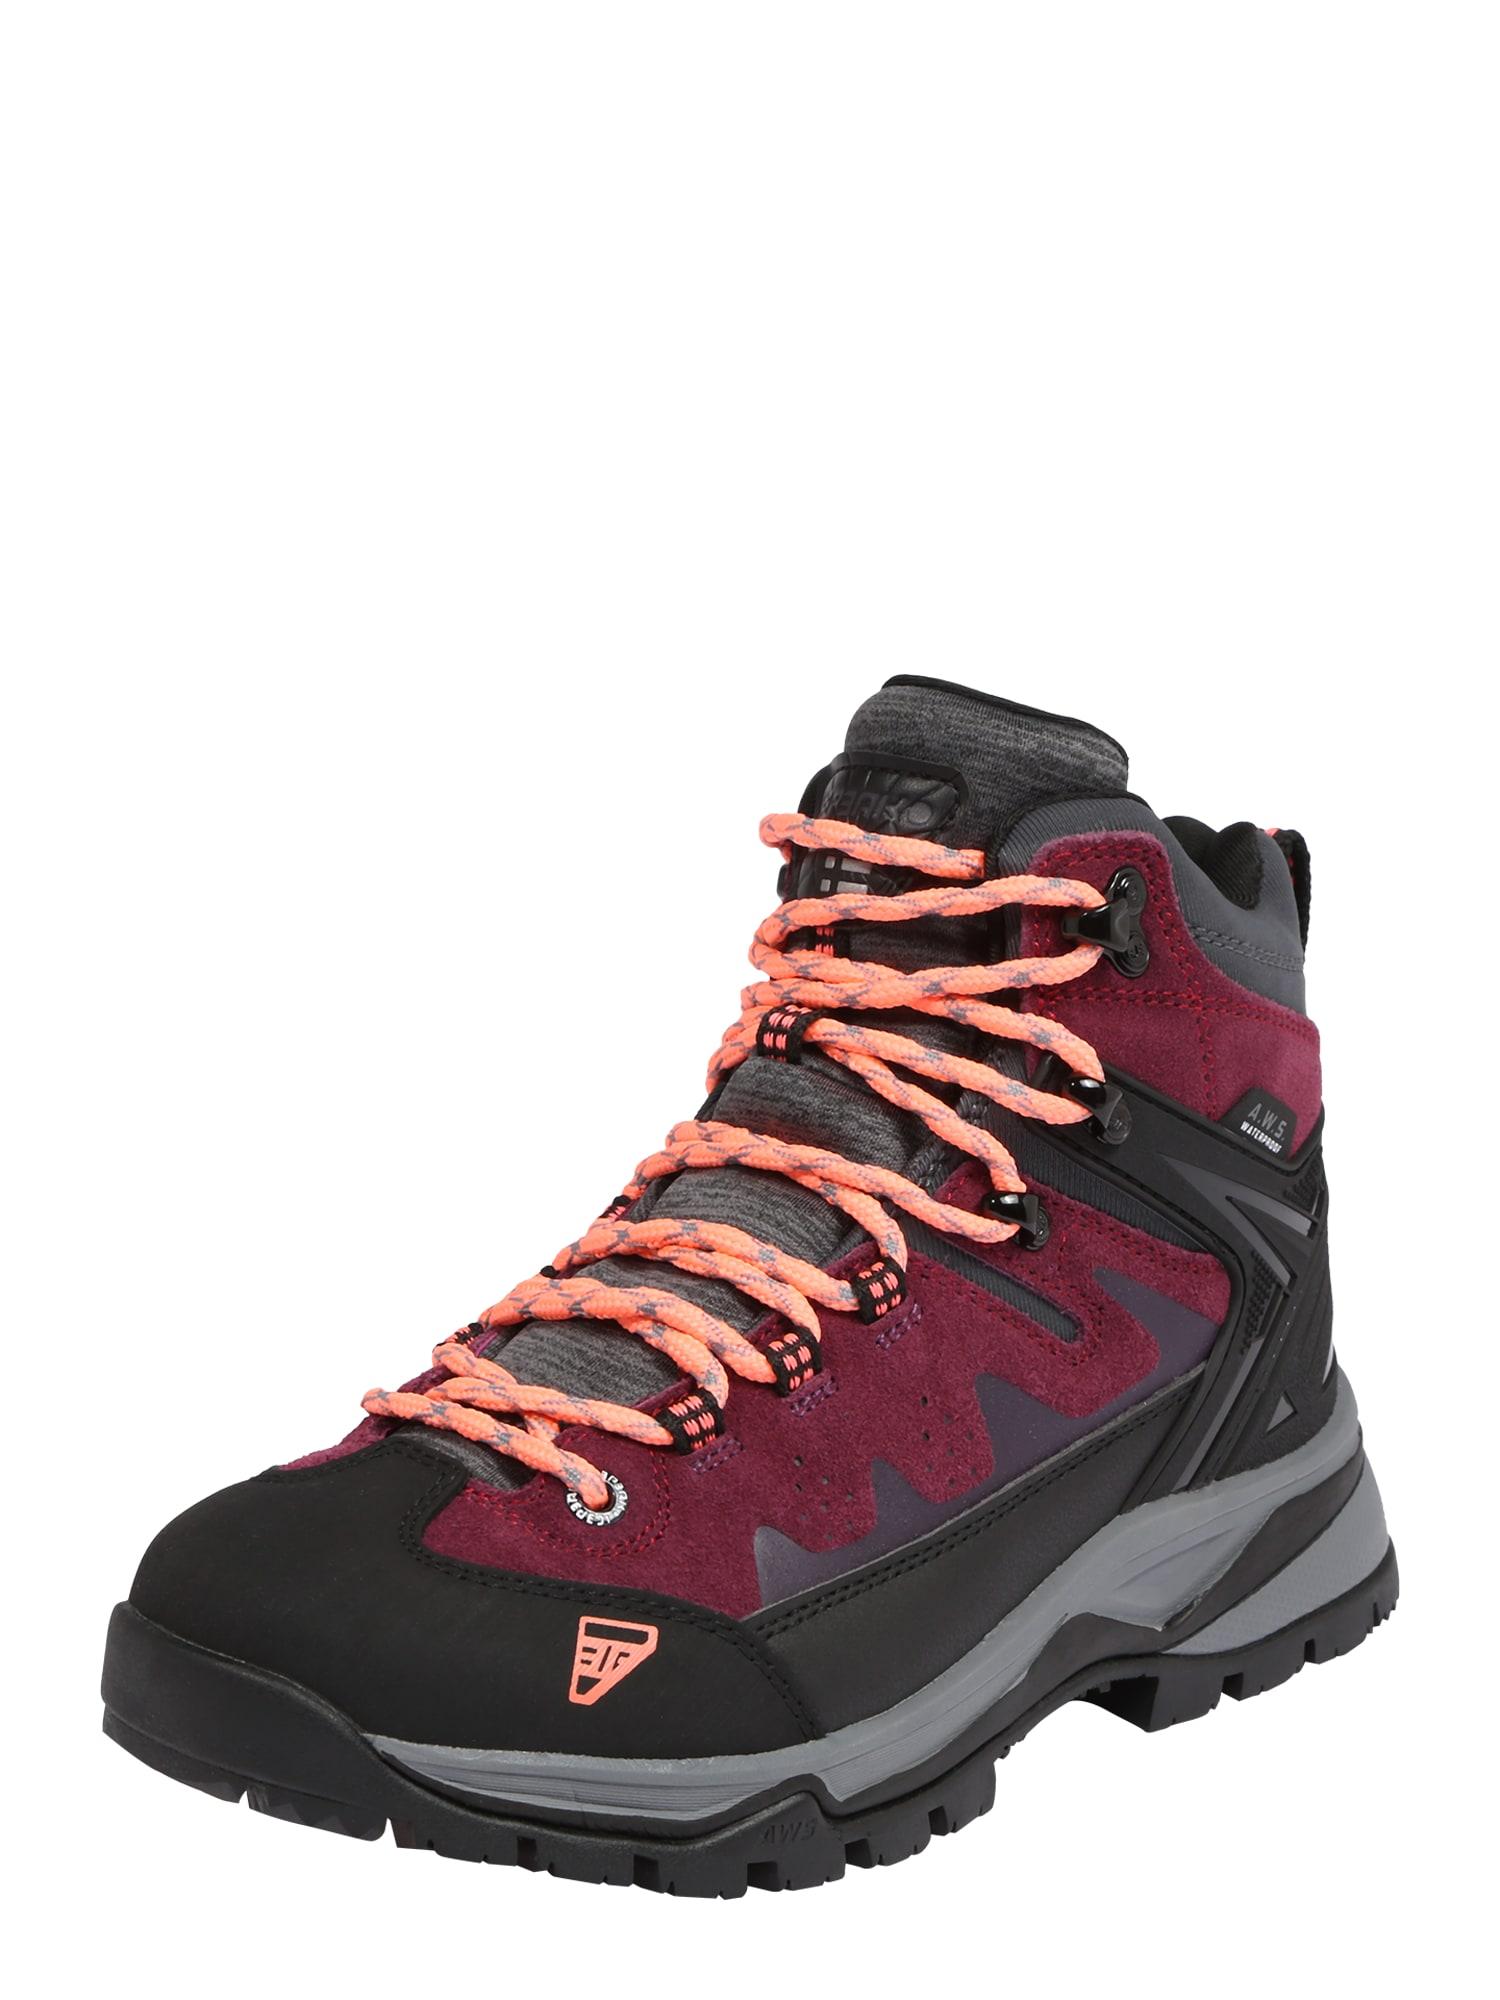 ICEPEAK Auliniai batai